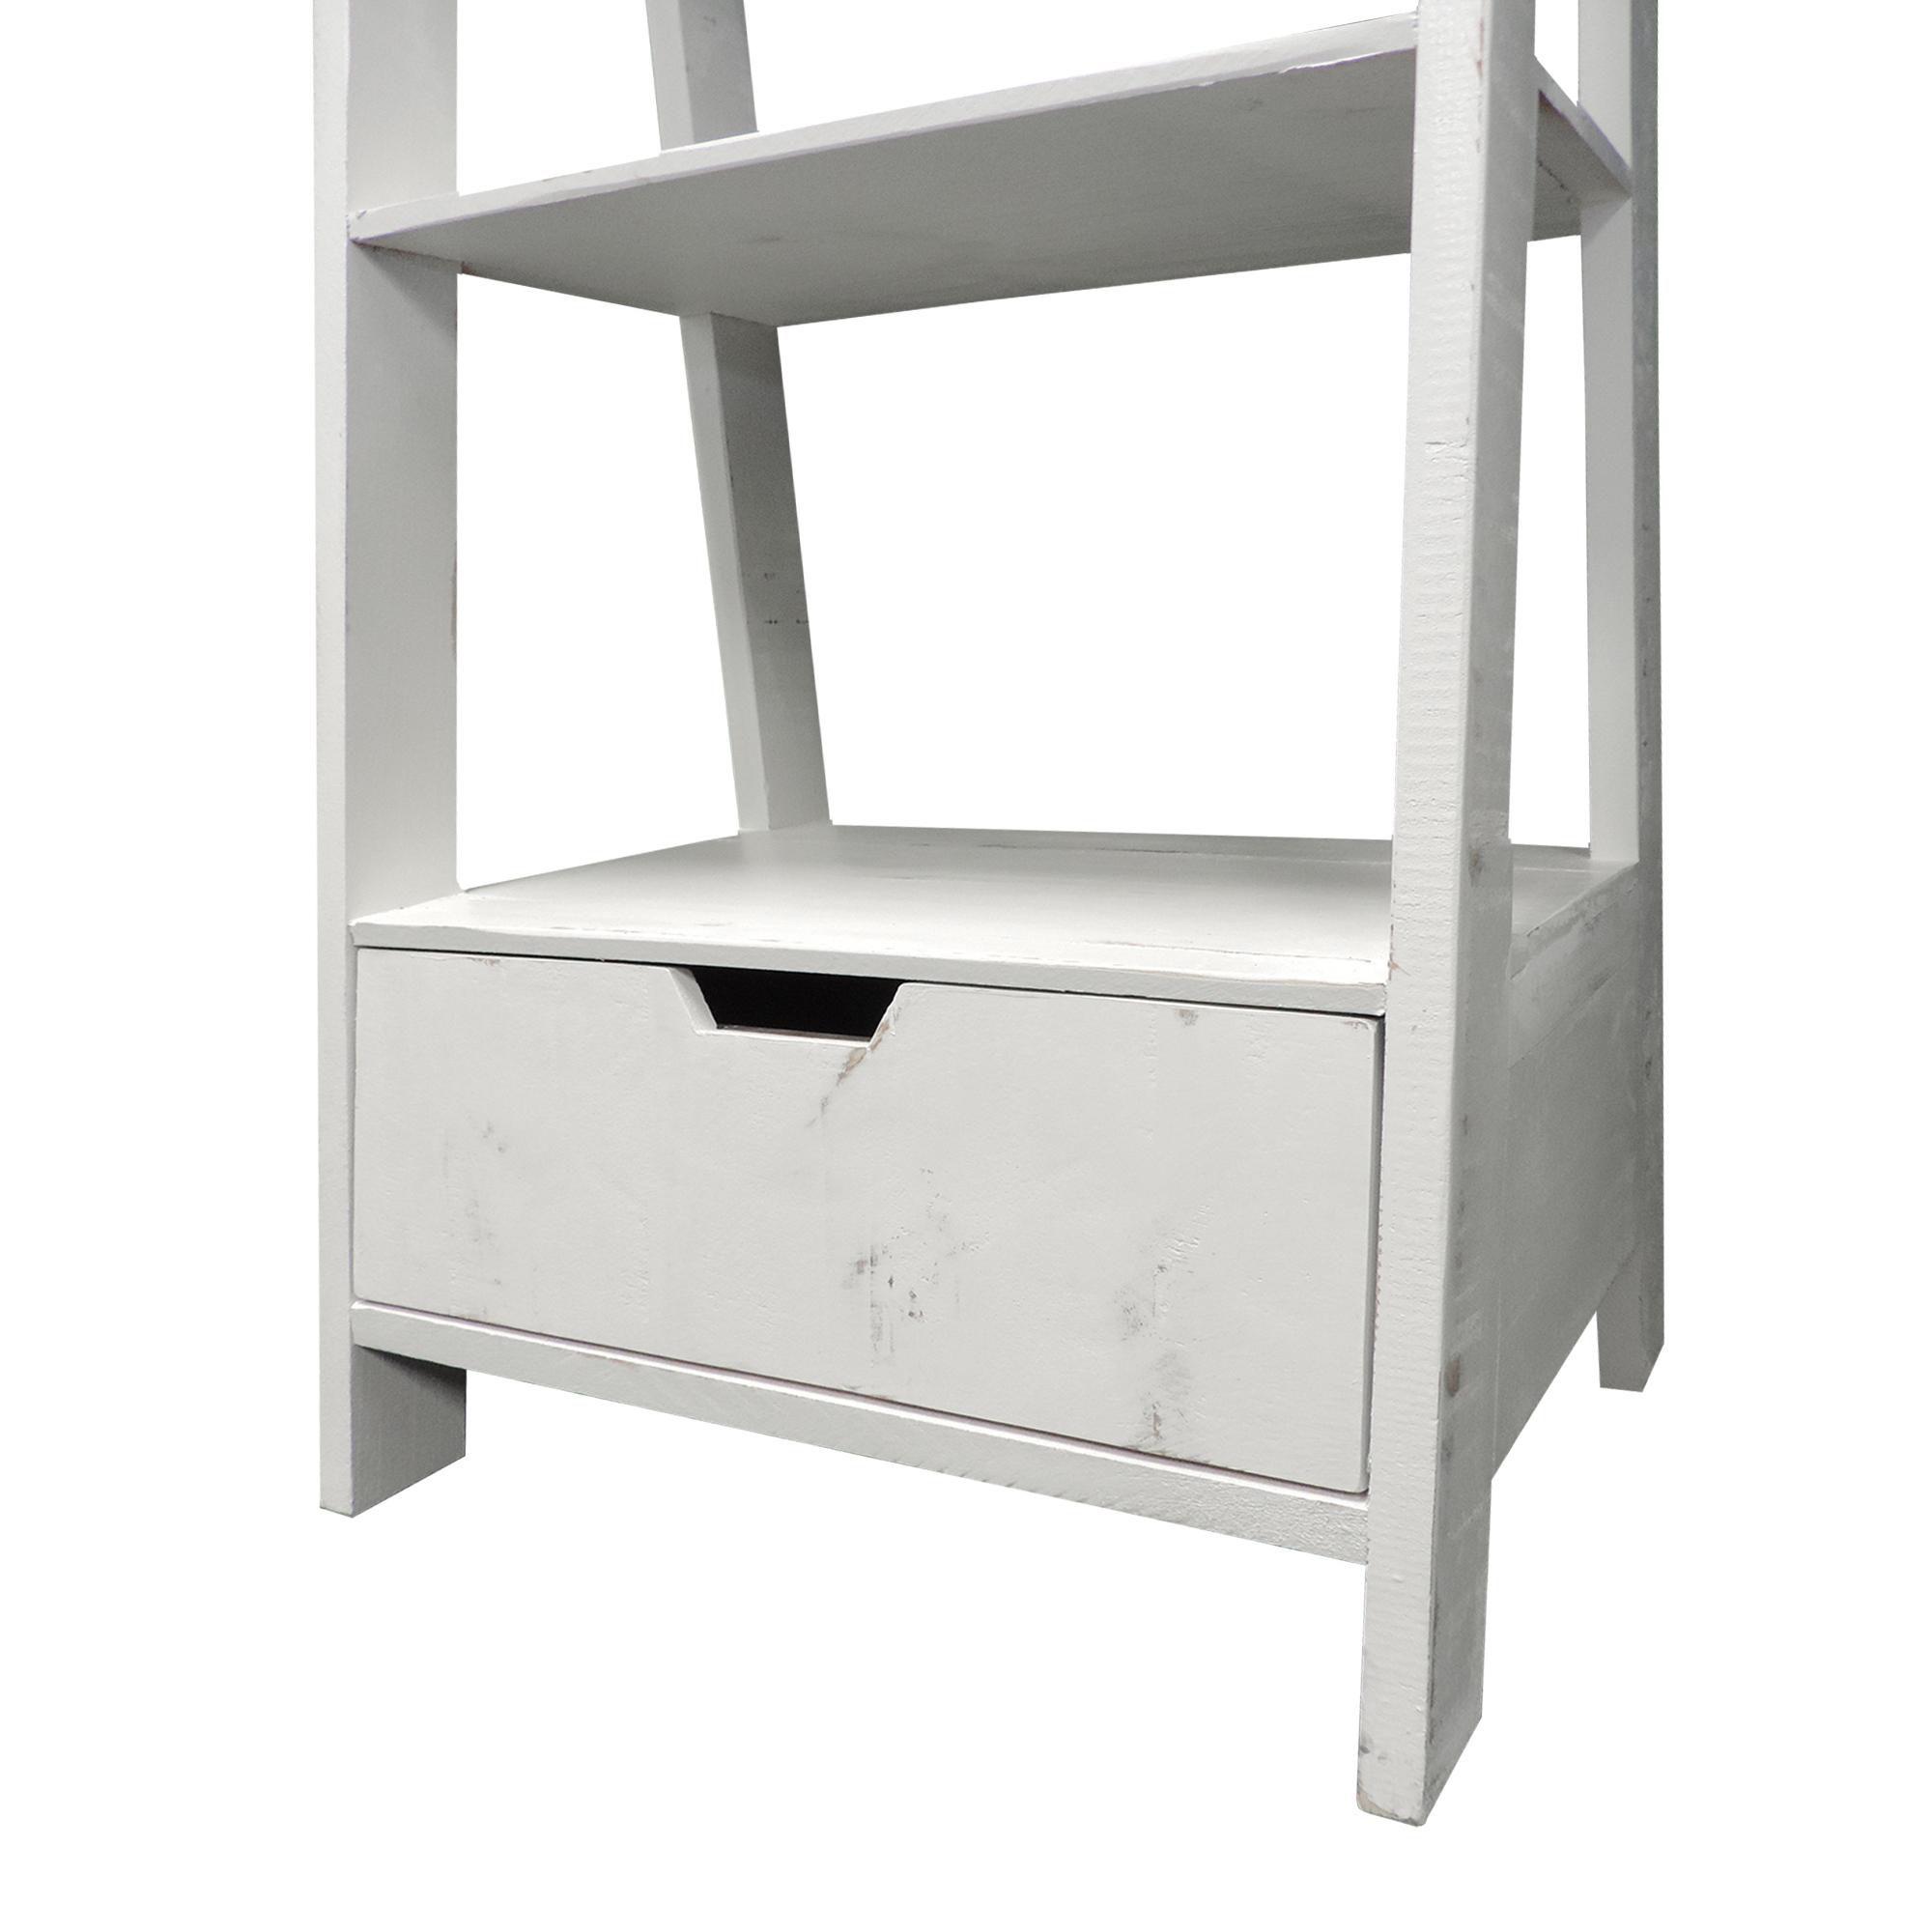 4 Shelf Wooden Ladder Bookcase with Bottom Drawer, Distressed white , Saltoro Sherpi